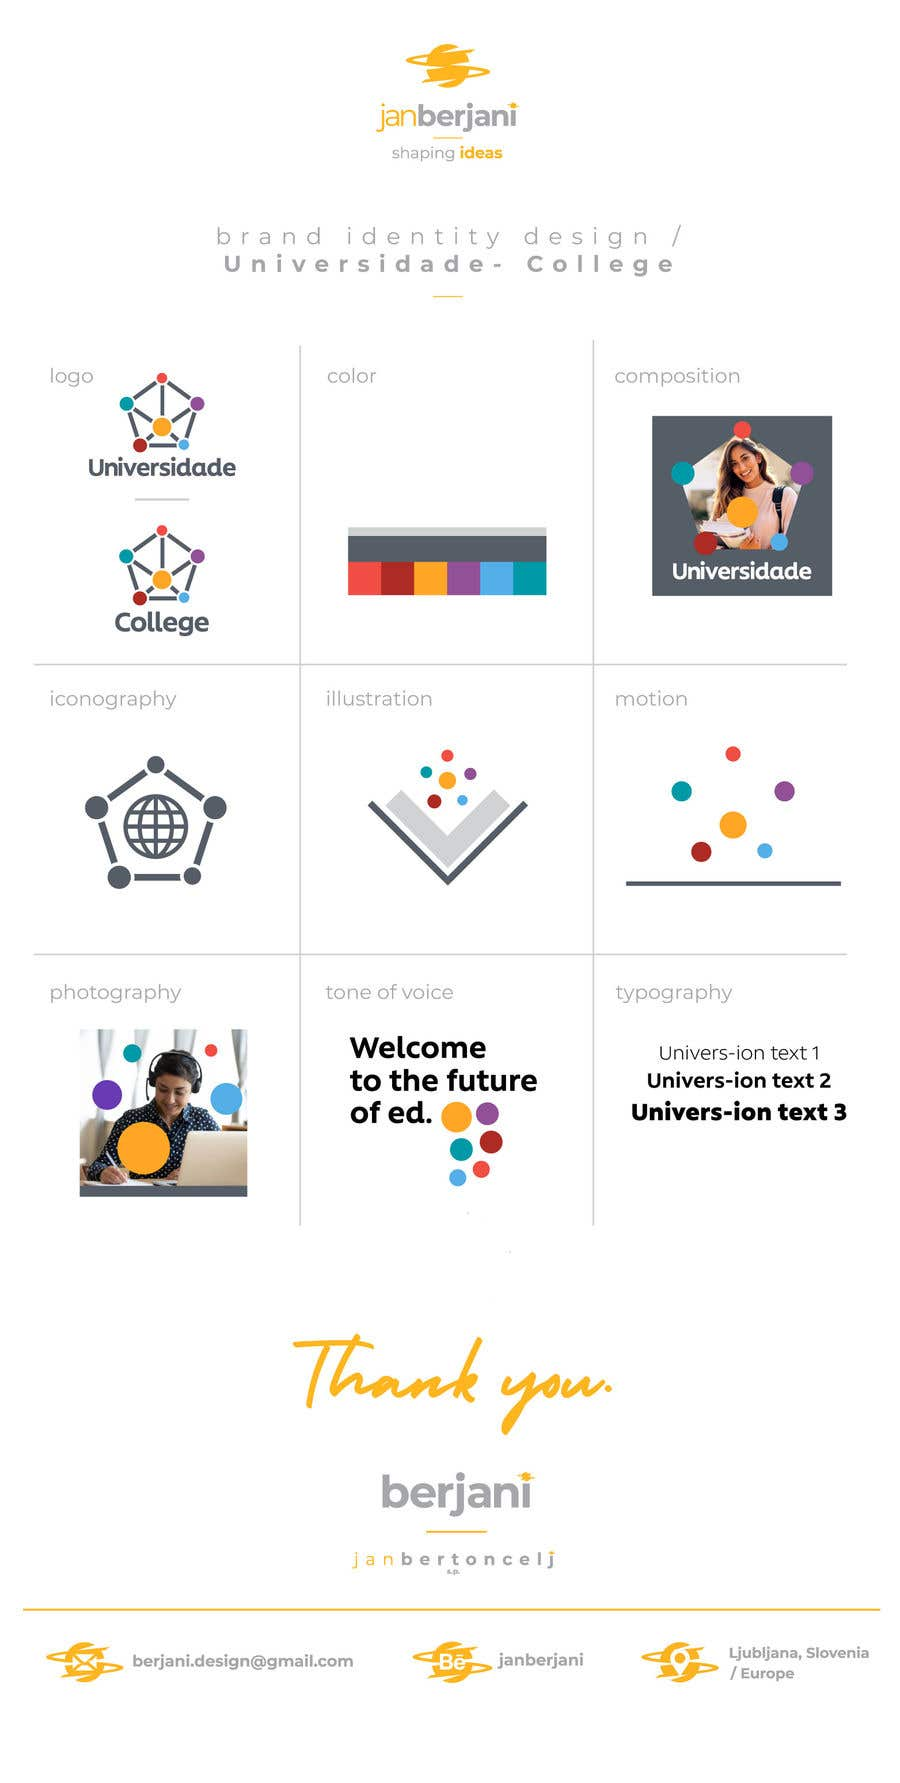 Penyertaan Peraduan #                                        179                                      untuk                                         Complete Brand Book, Company Design Guideline